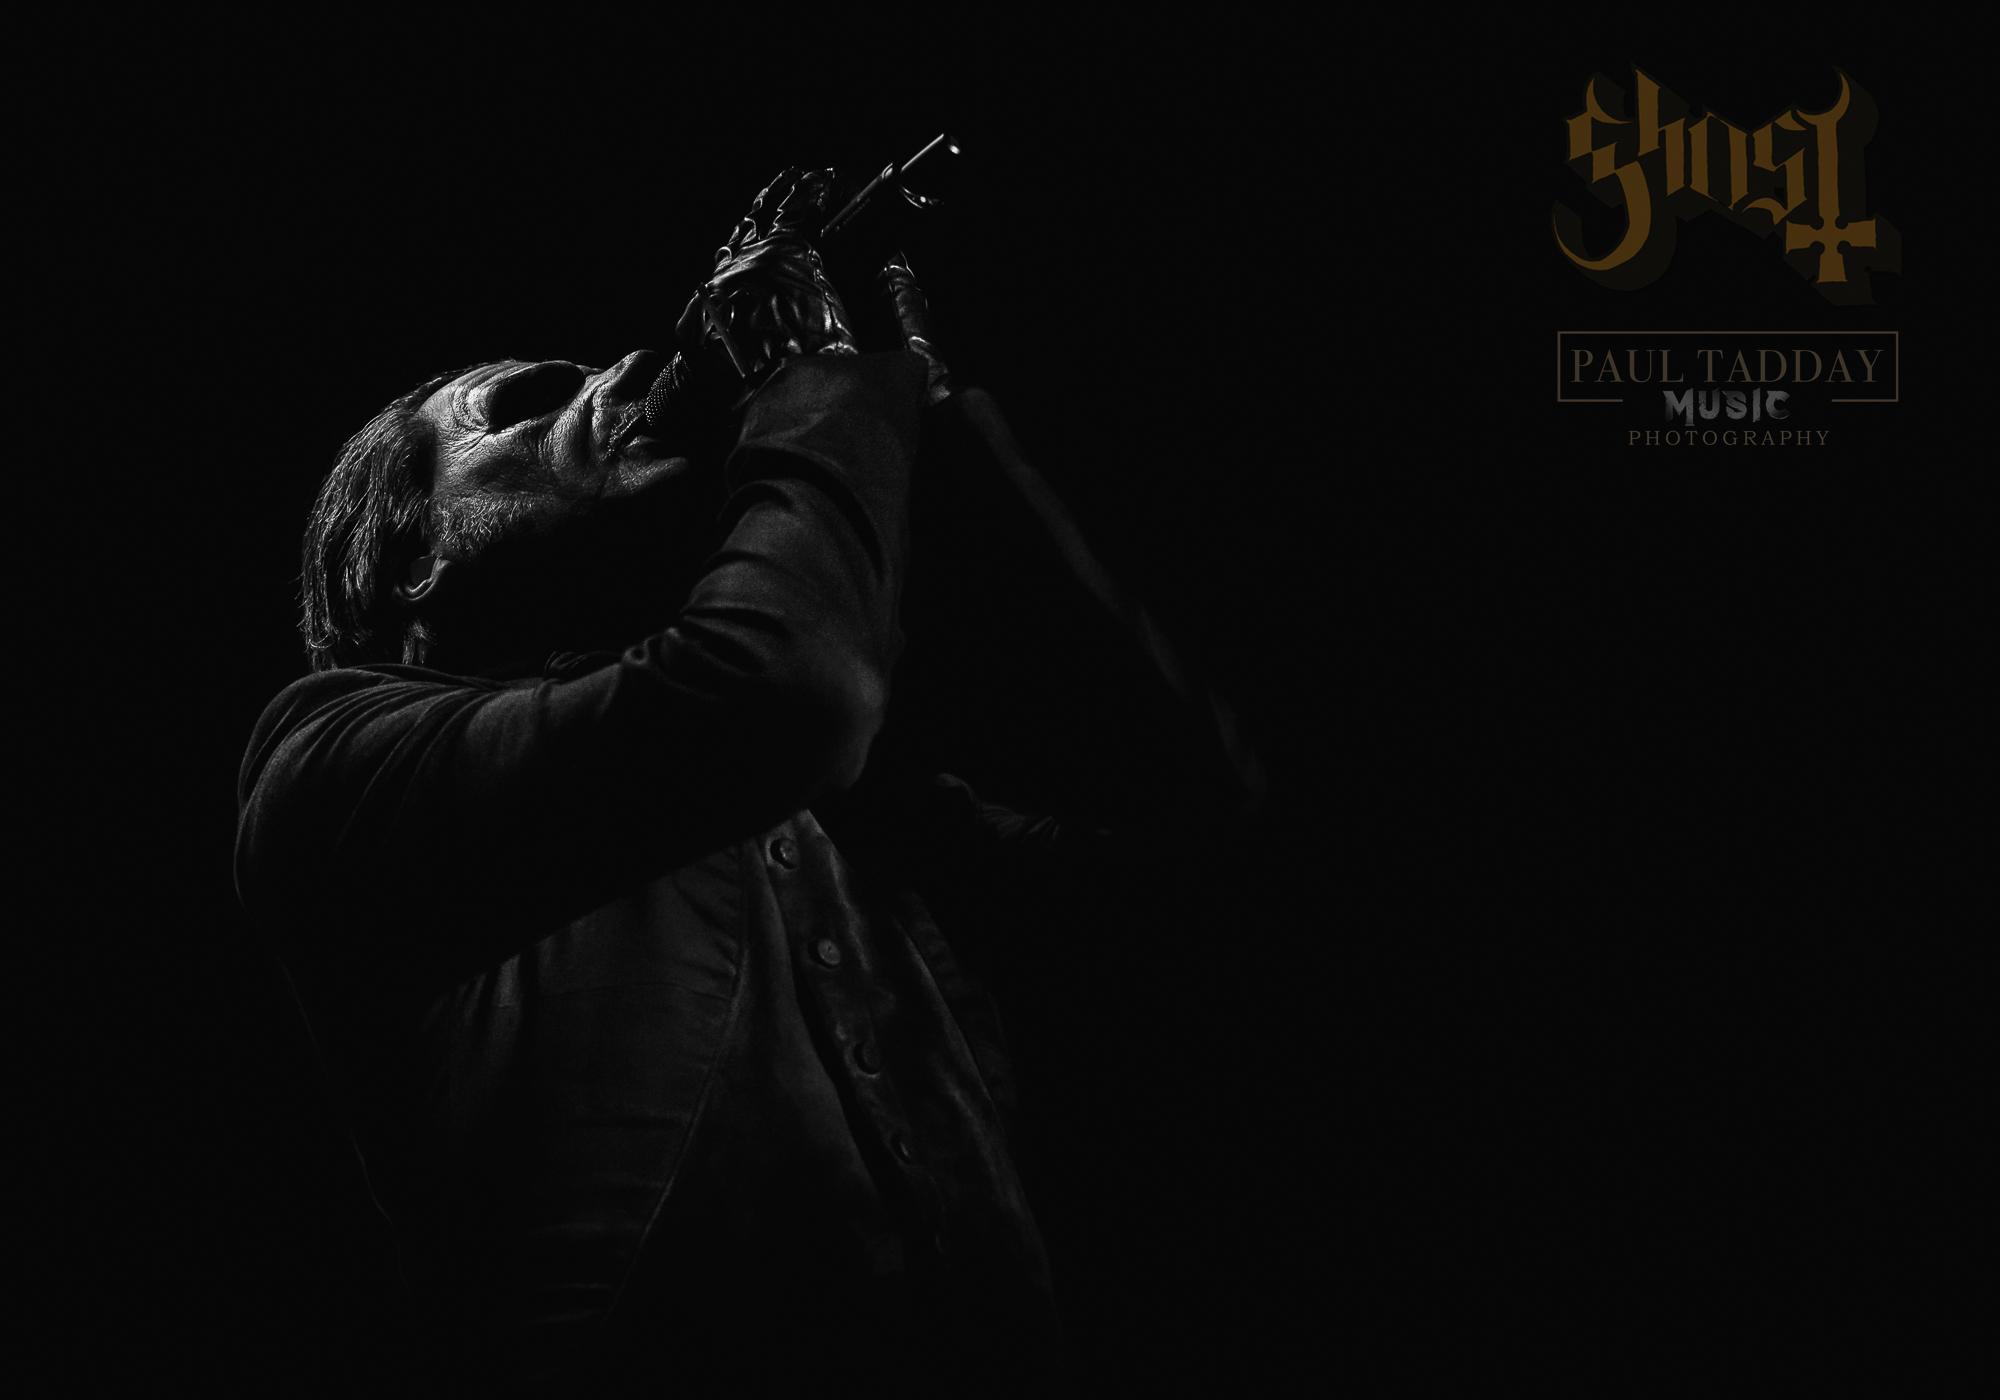 ghost-brisbane-download_2019-paul_tadday-web-32.jpg